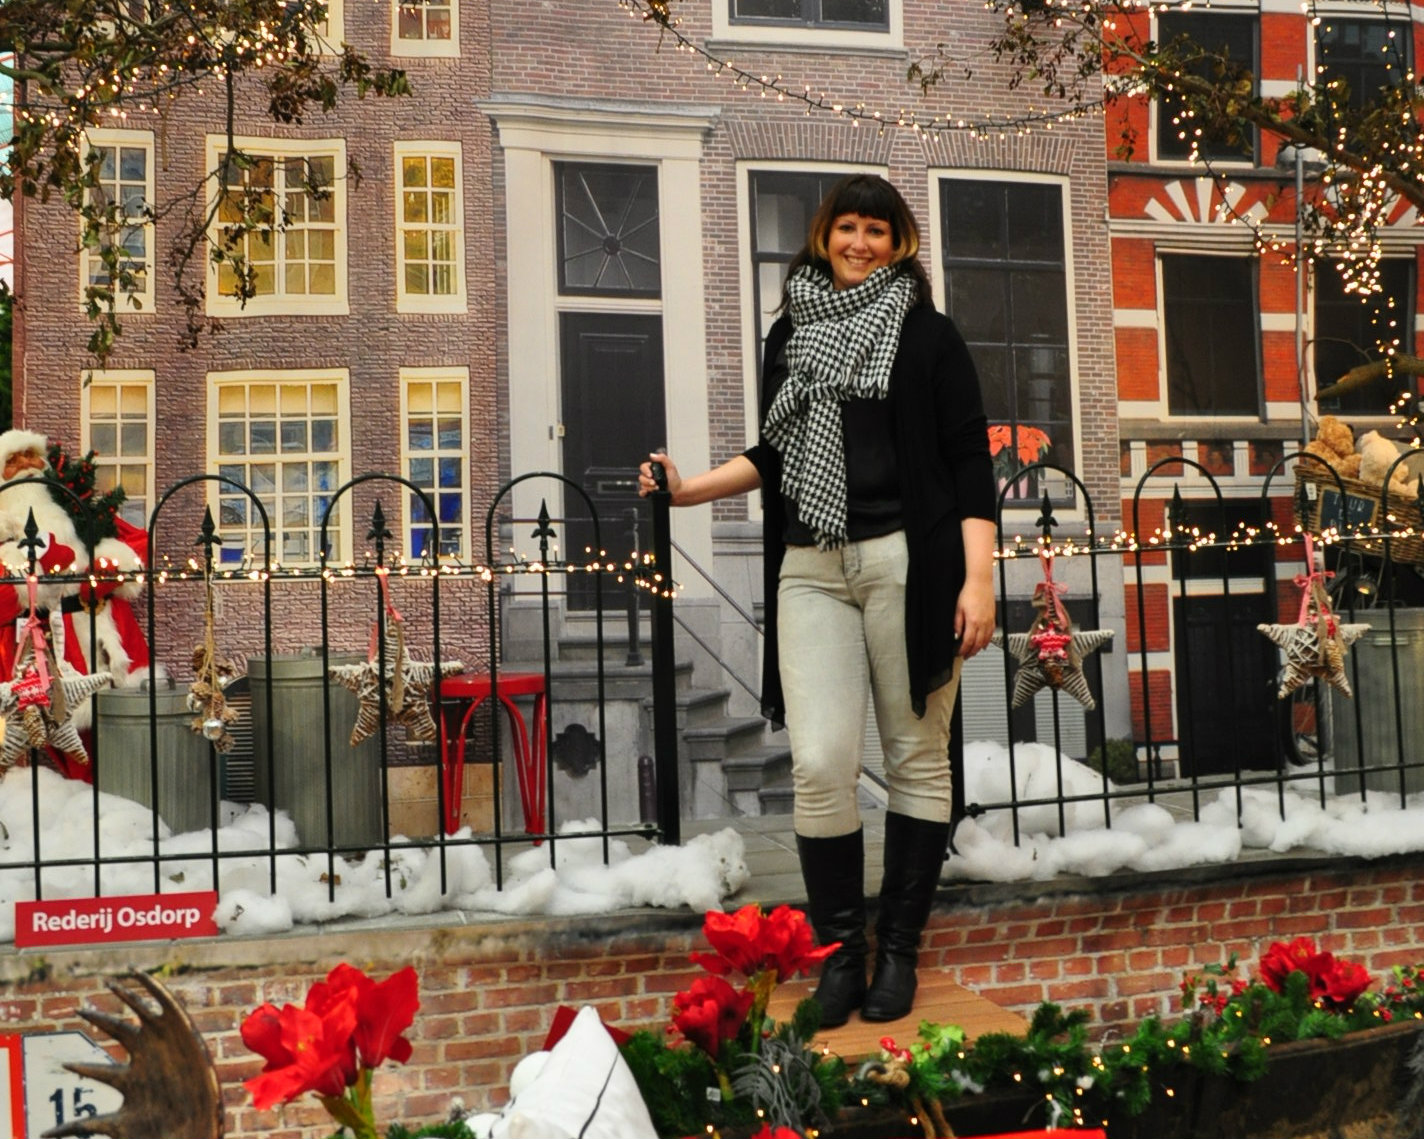 Kerstshow tuincentrum osdorp 2014 amsterdamse nostalgie for Tuincentrum amsterdam